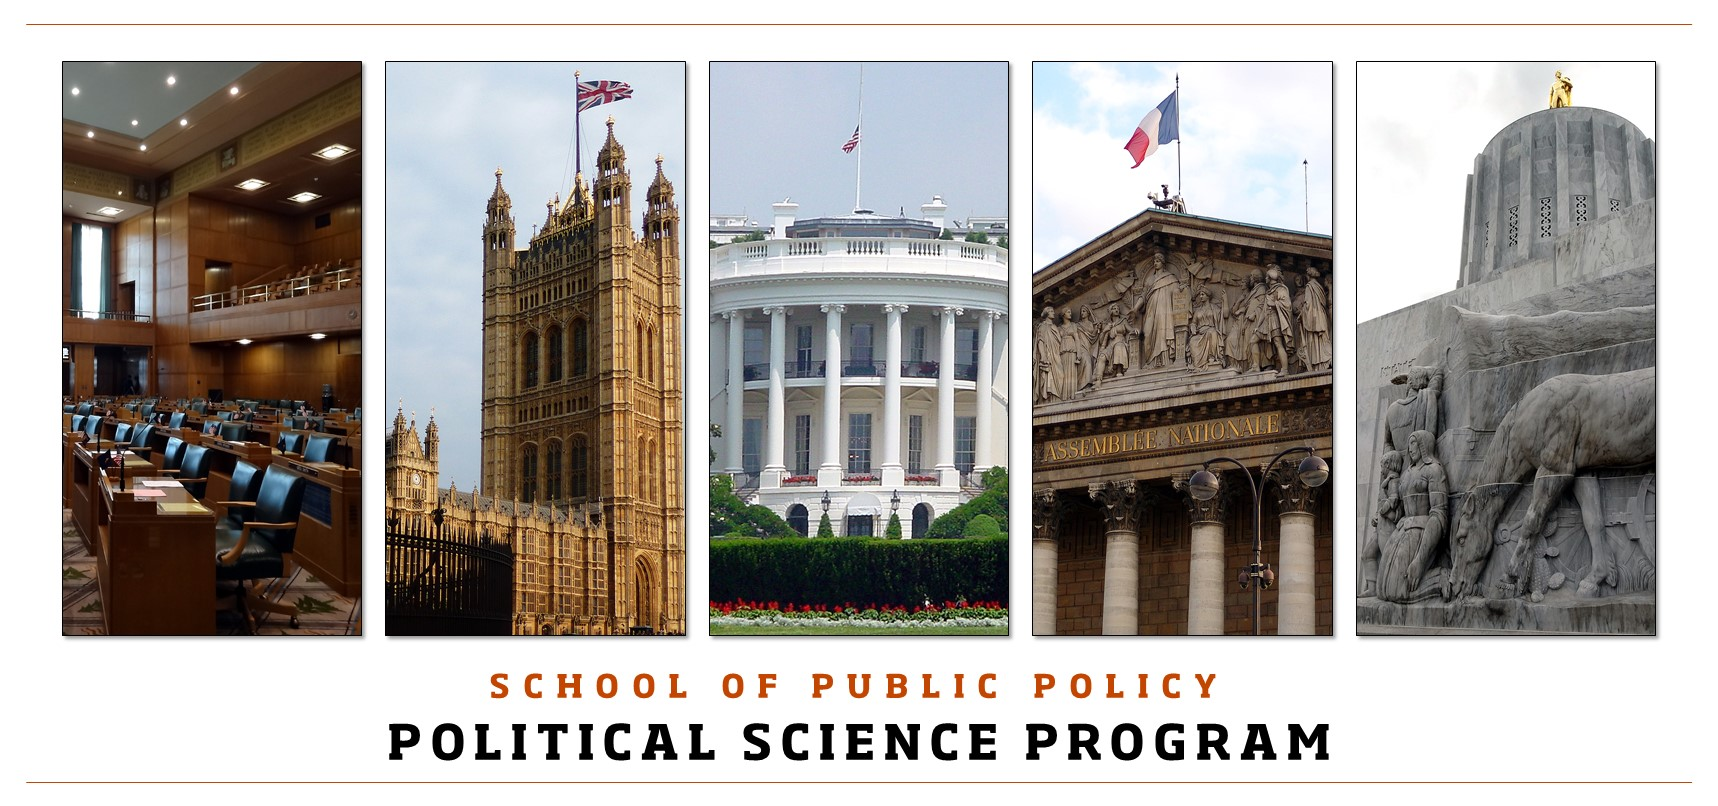 School of Public Policy Political Science Program